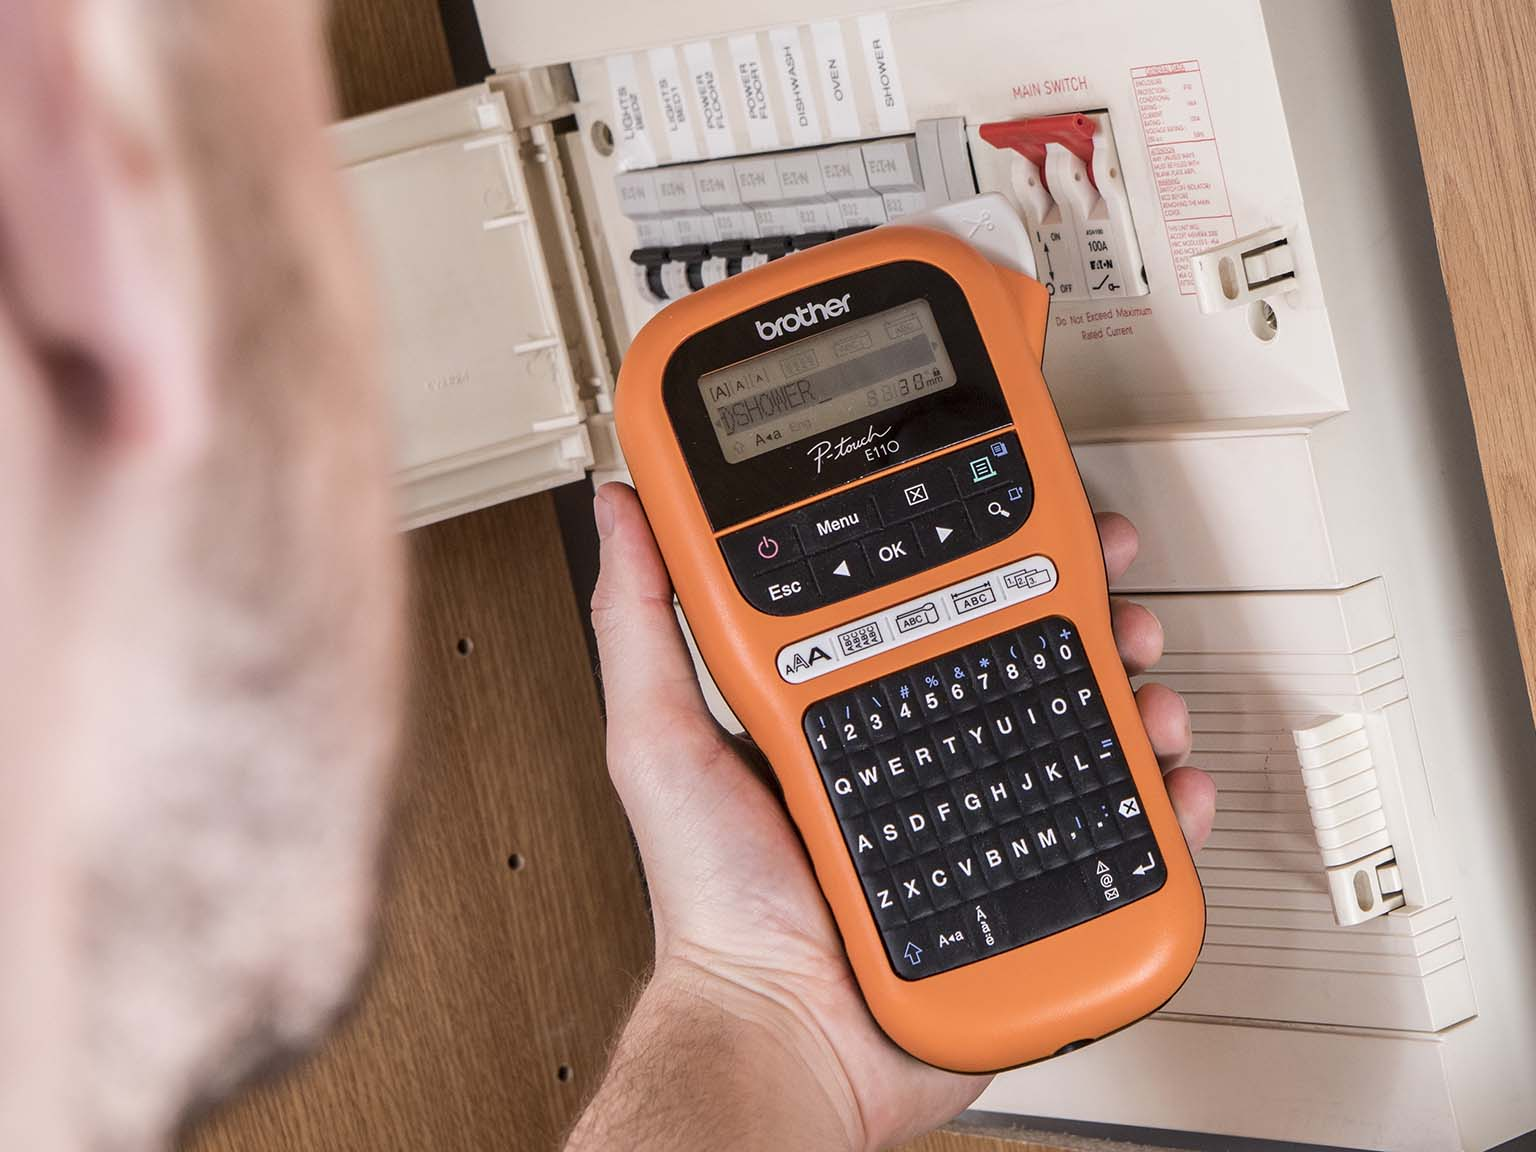 Brother P-touch E110 label printer